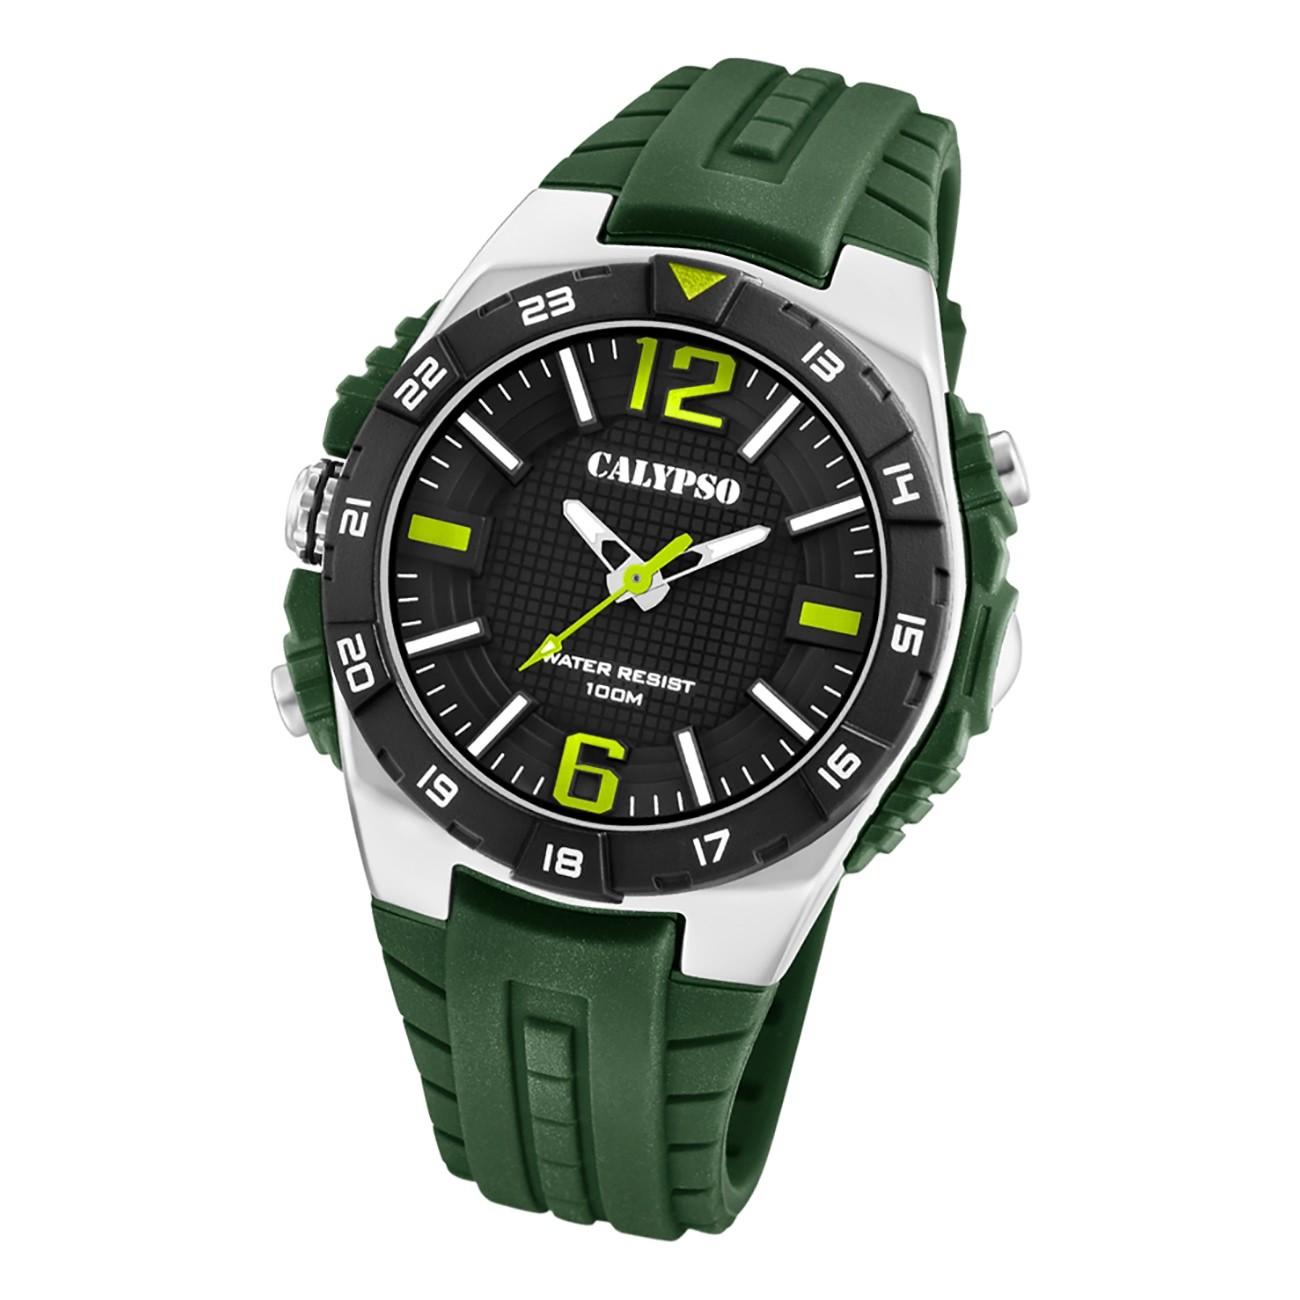 Calypso Herren Jugend Armbanduhr Outdoor K5778/2 Analog Kunststoff grün UK5778/2